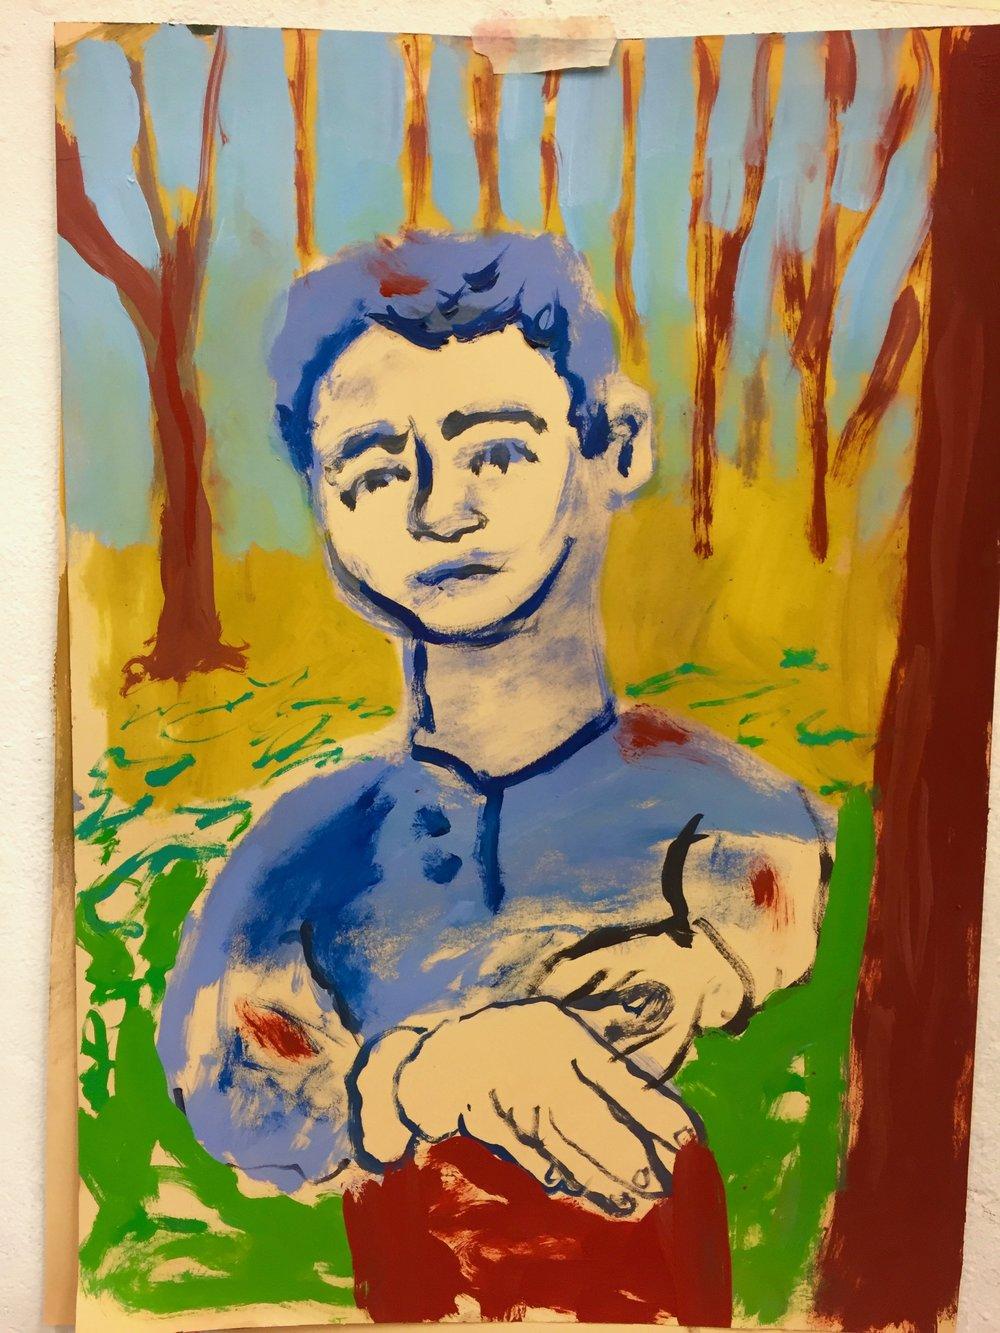 Self portrait, 2017. Oil on paper, 18x24 inches.